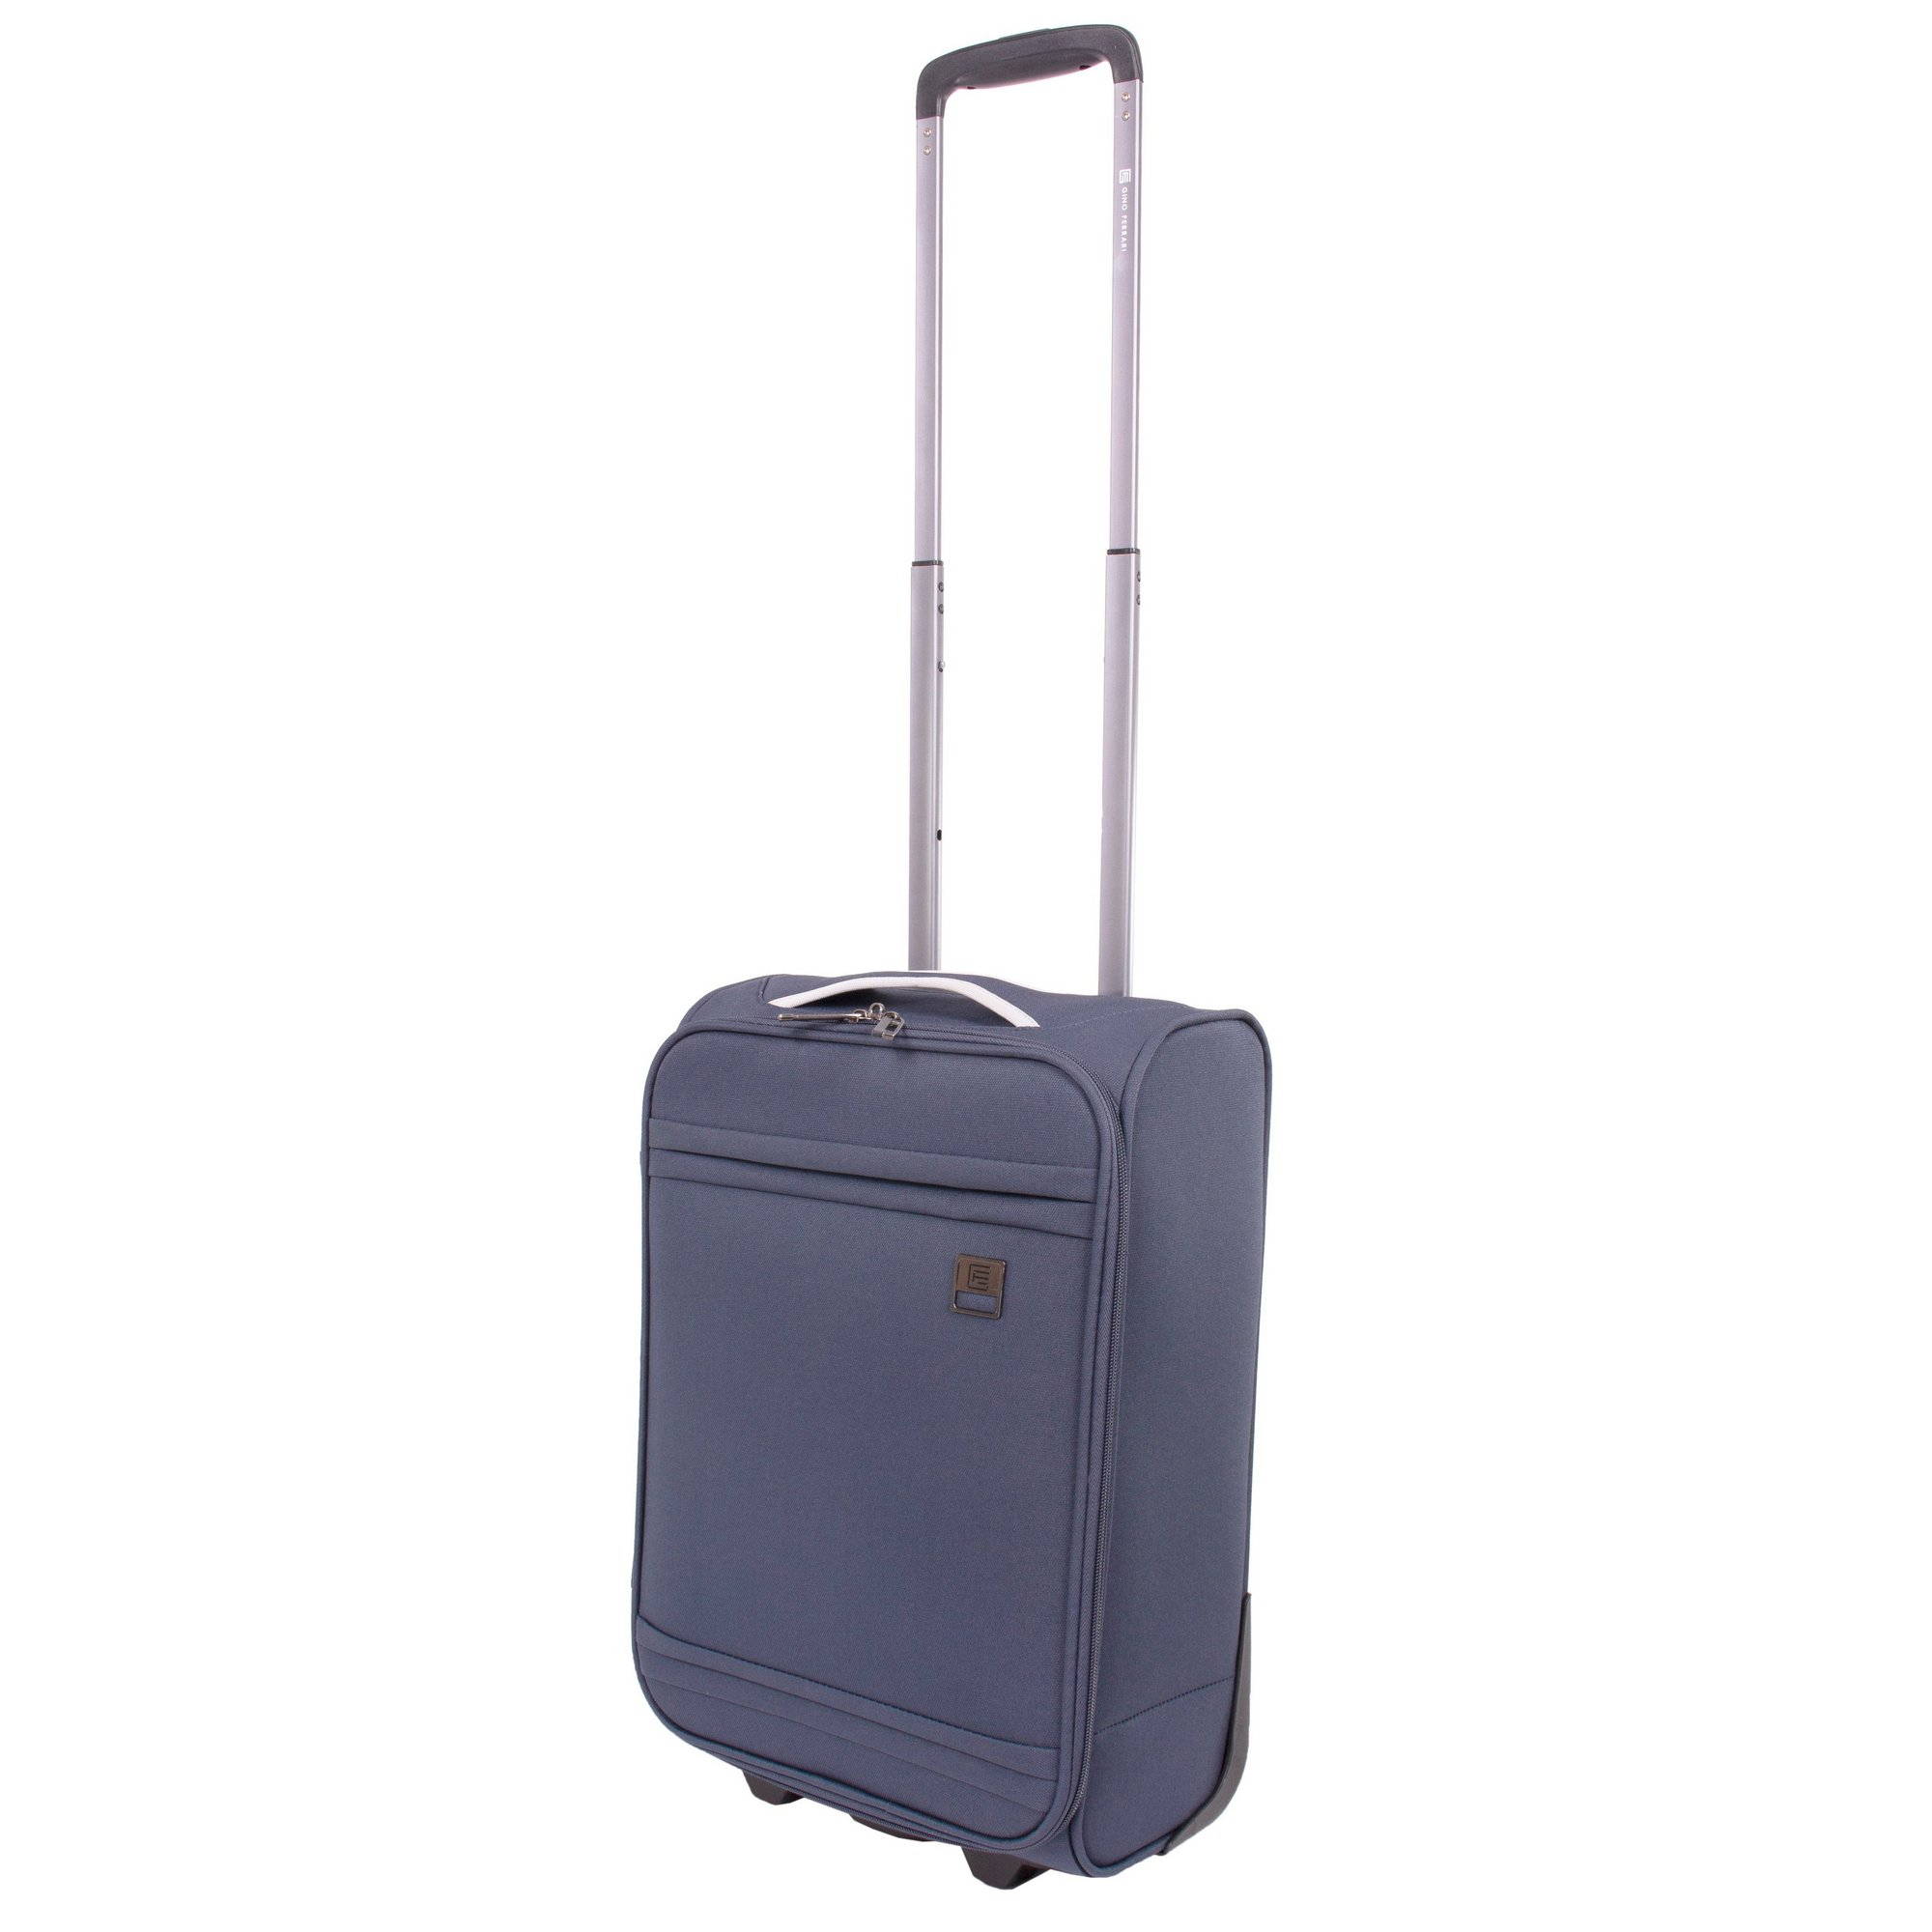 Image of Gino Ferrari Zara EVA Compact Suitcase